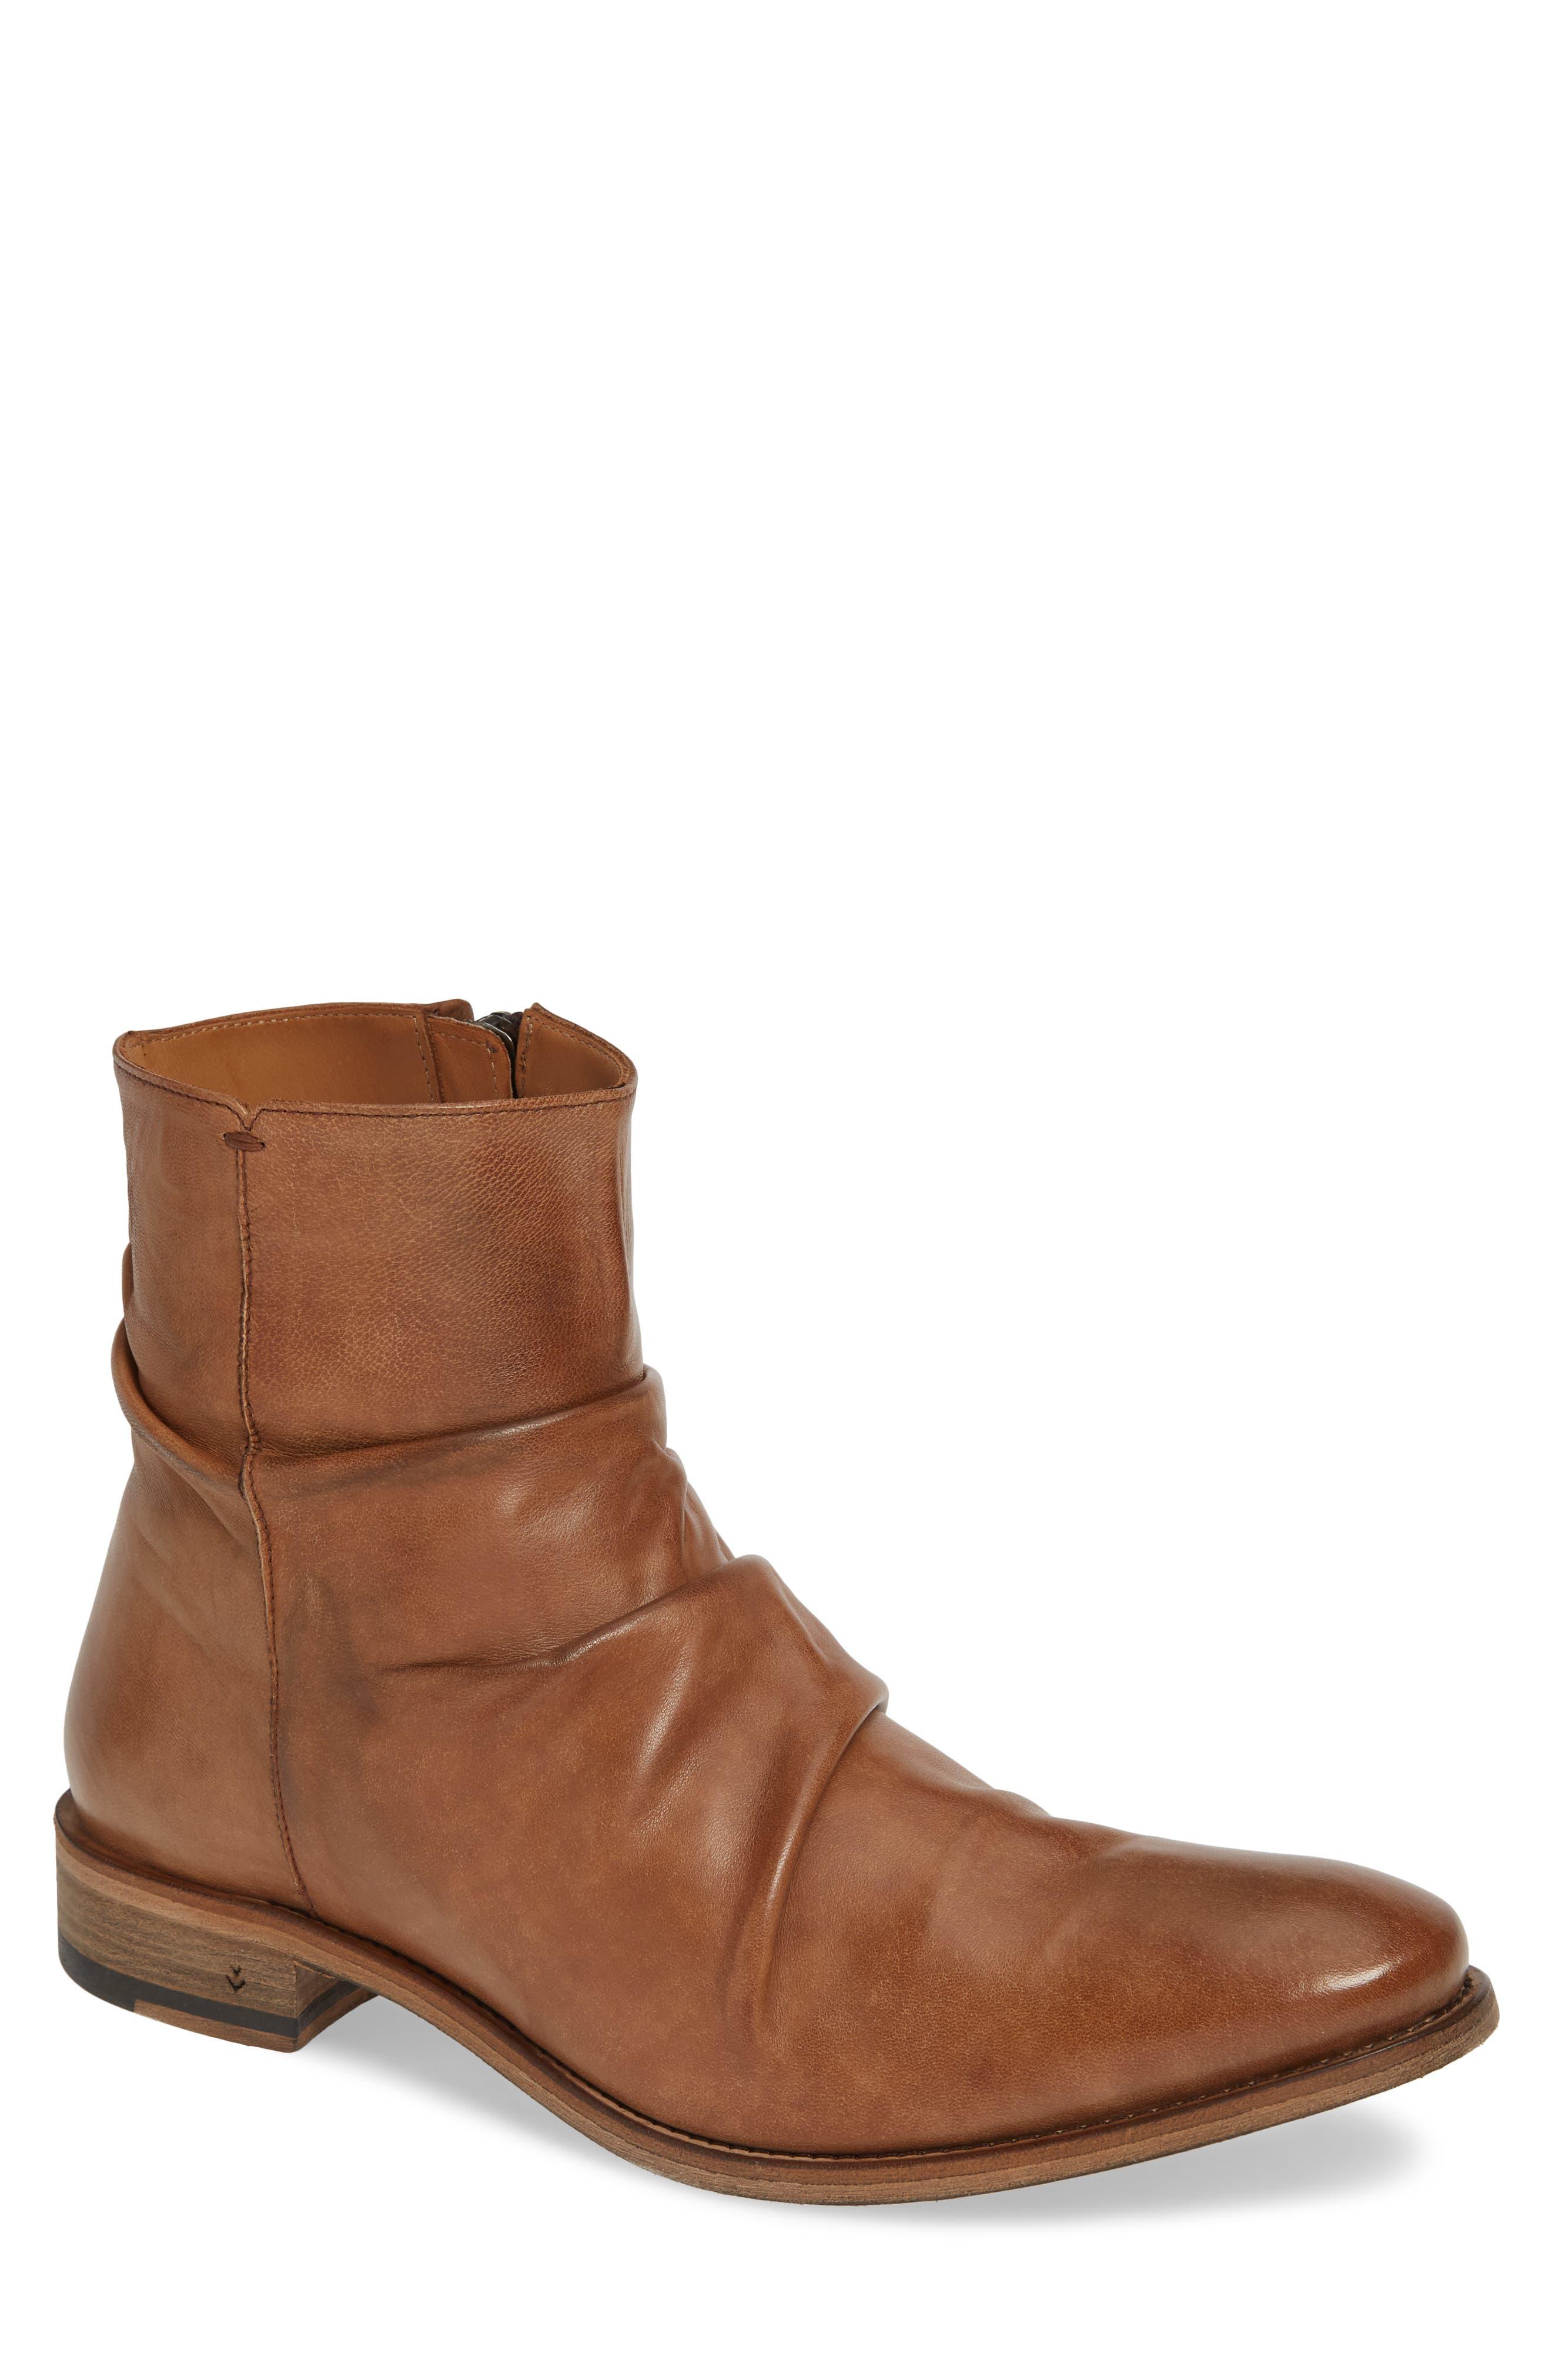 John Varvatos Collection Morrison Sherpei Boot, Brown